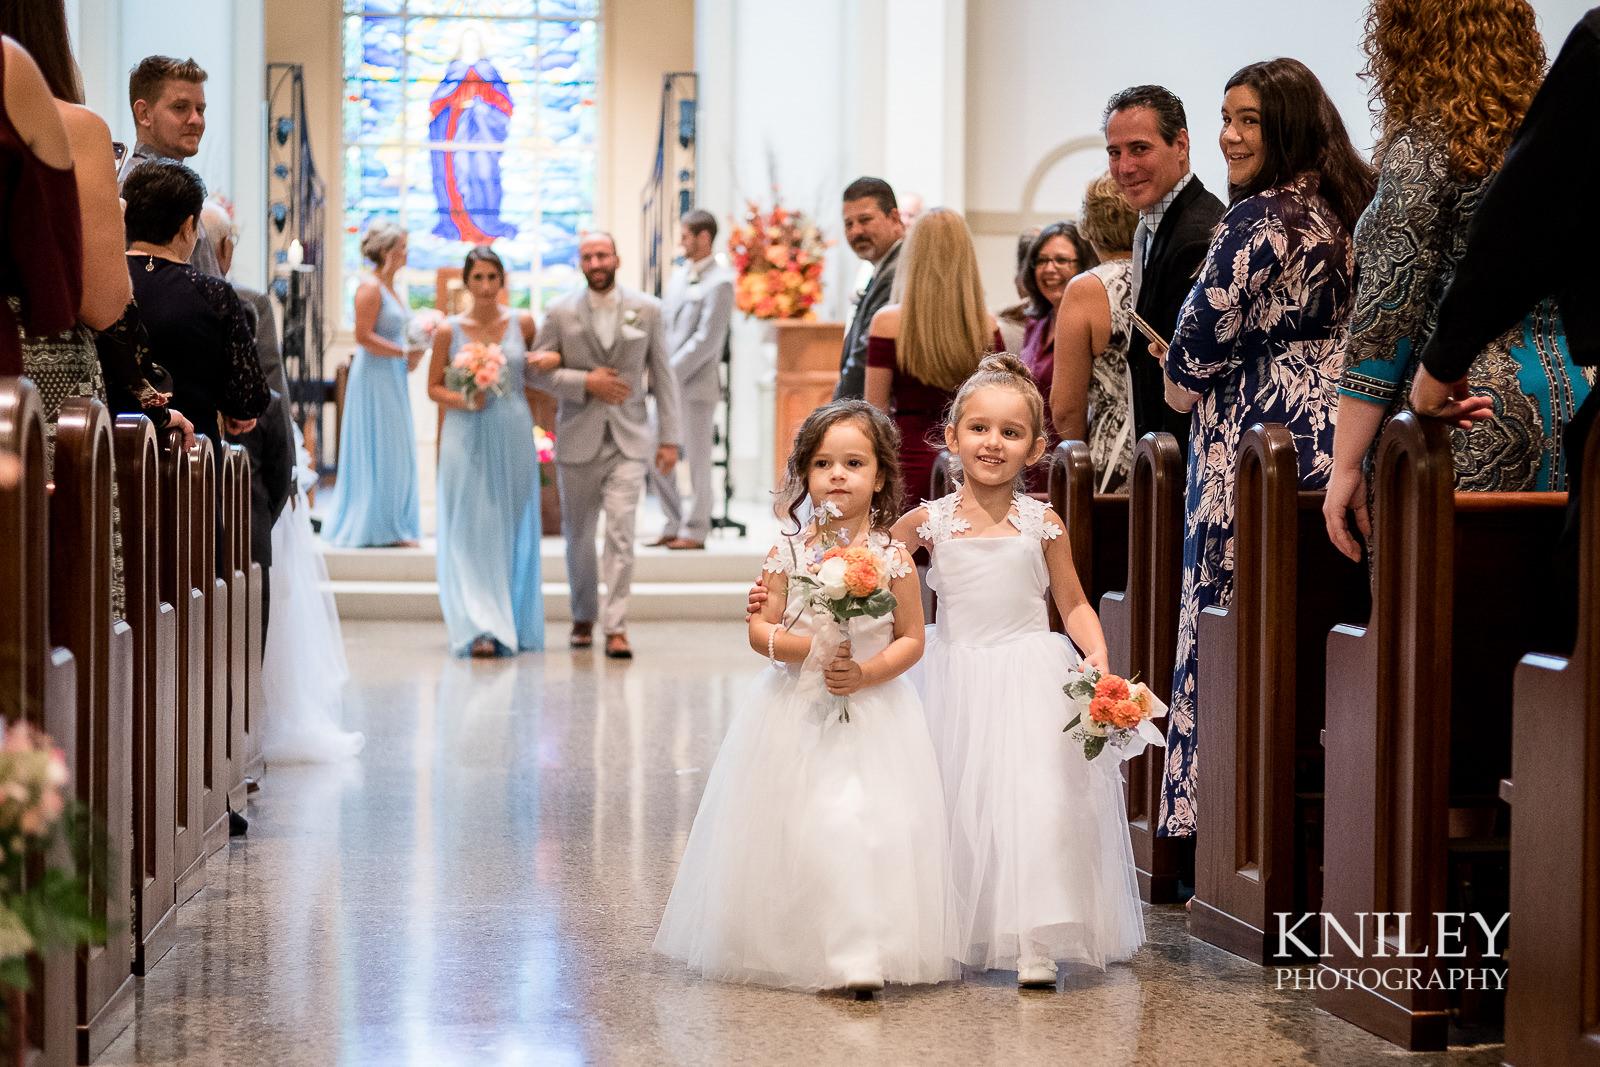 060 - Buffalo NY wedding pictures - St Marys Church - XT2A6963.jpg